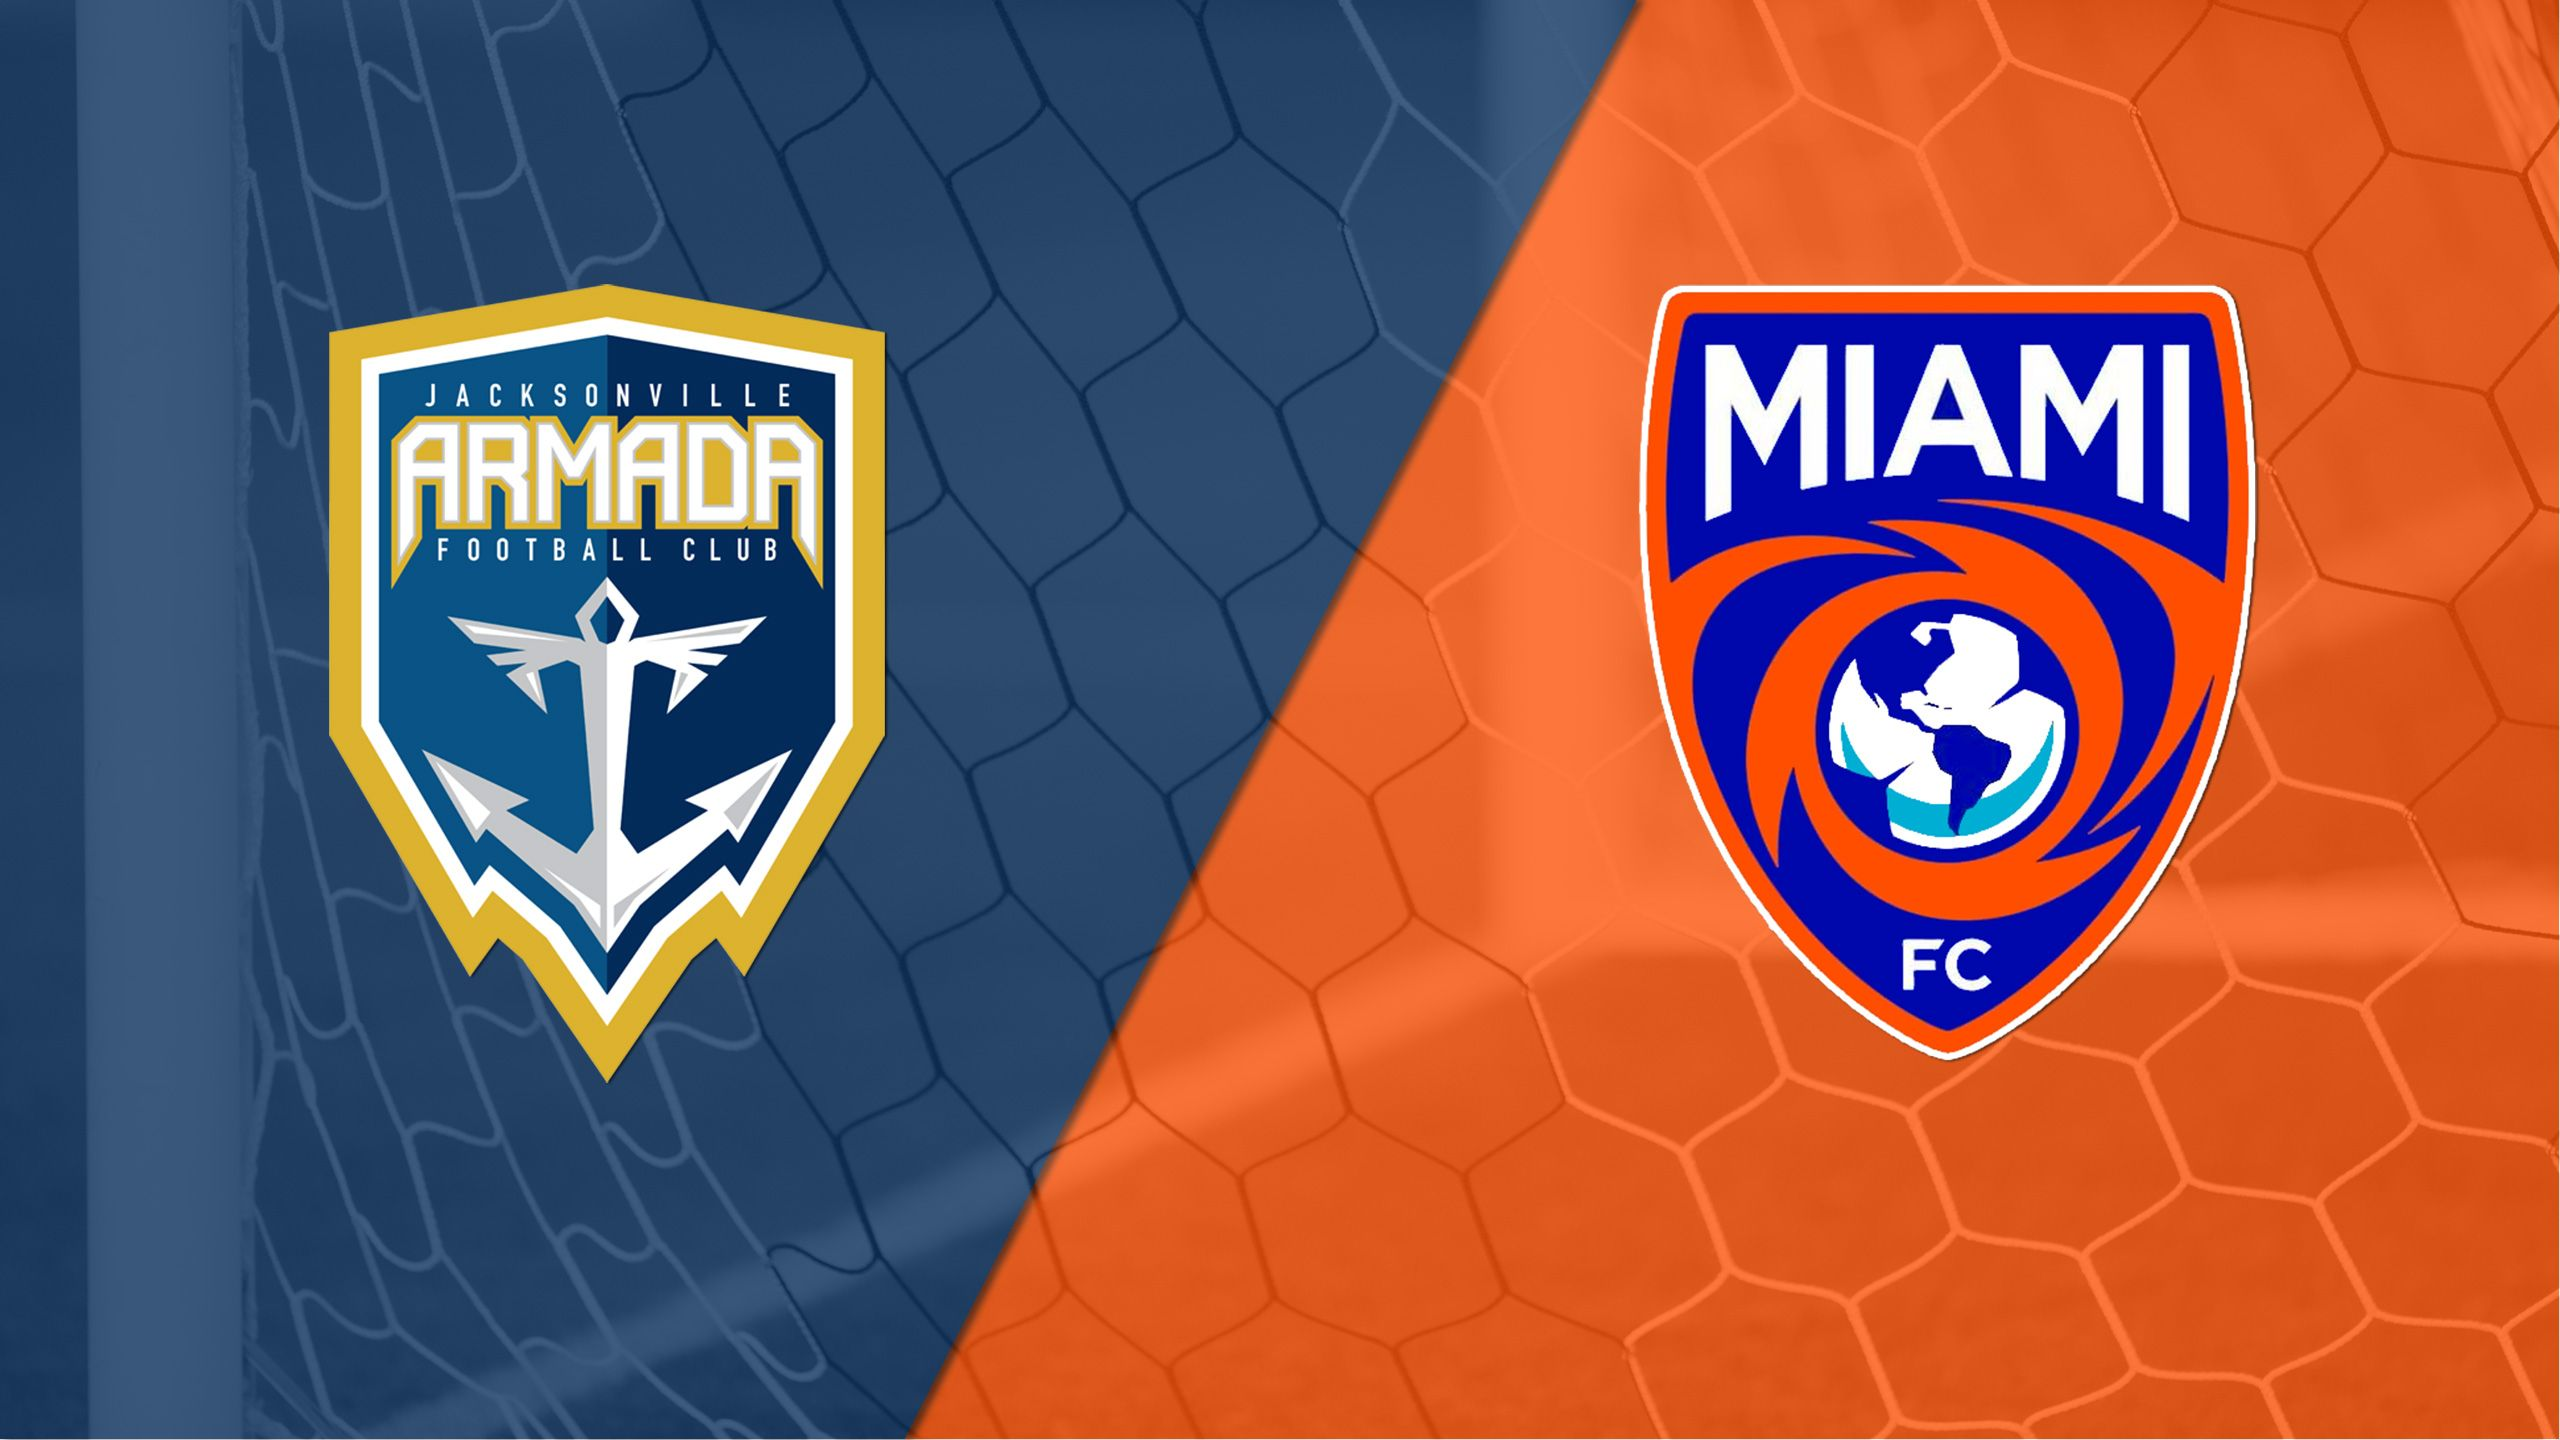 Jacksonville Armada vs. Miami FC